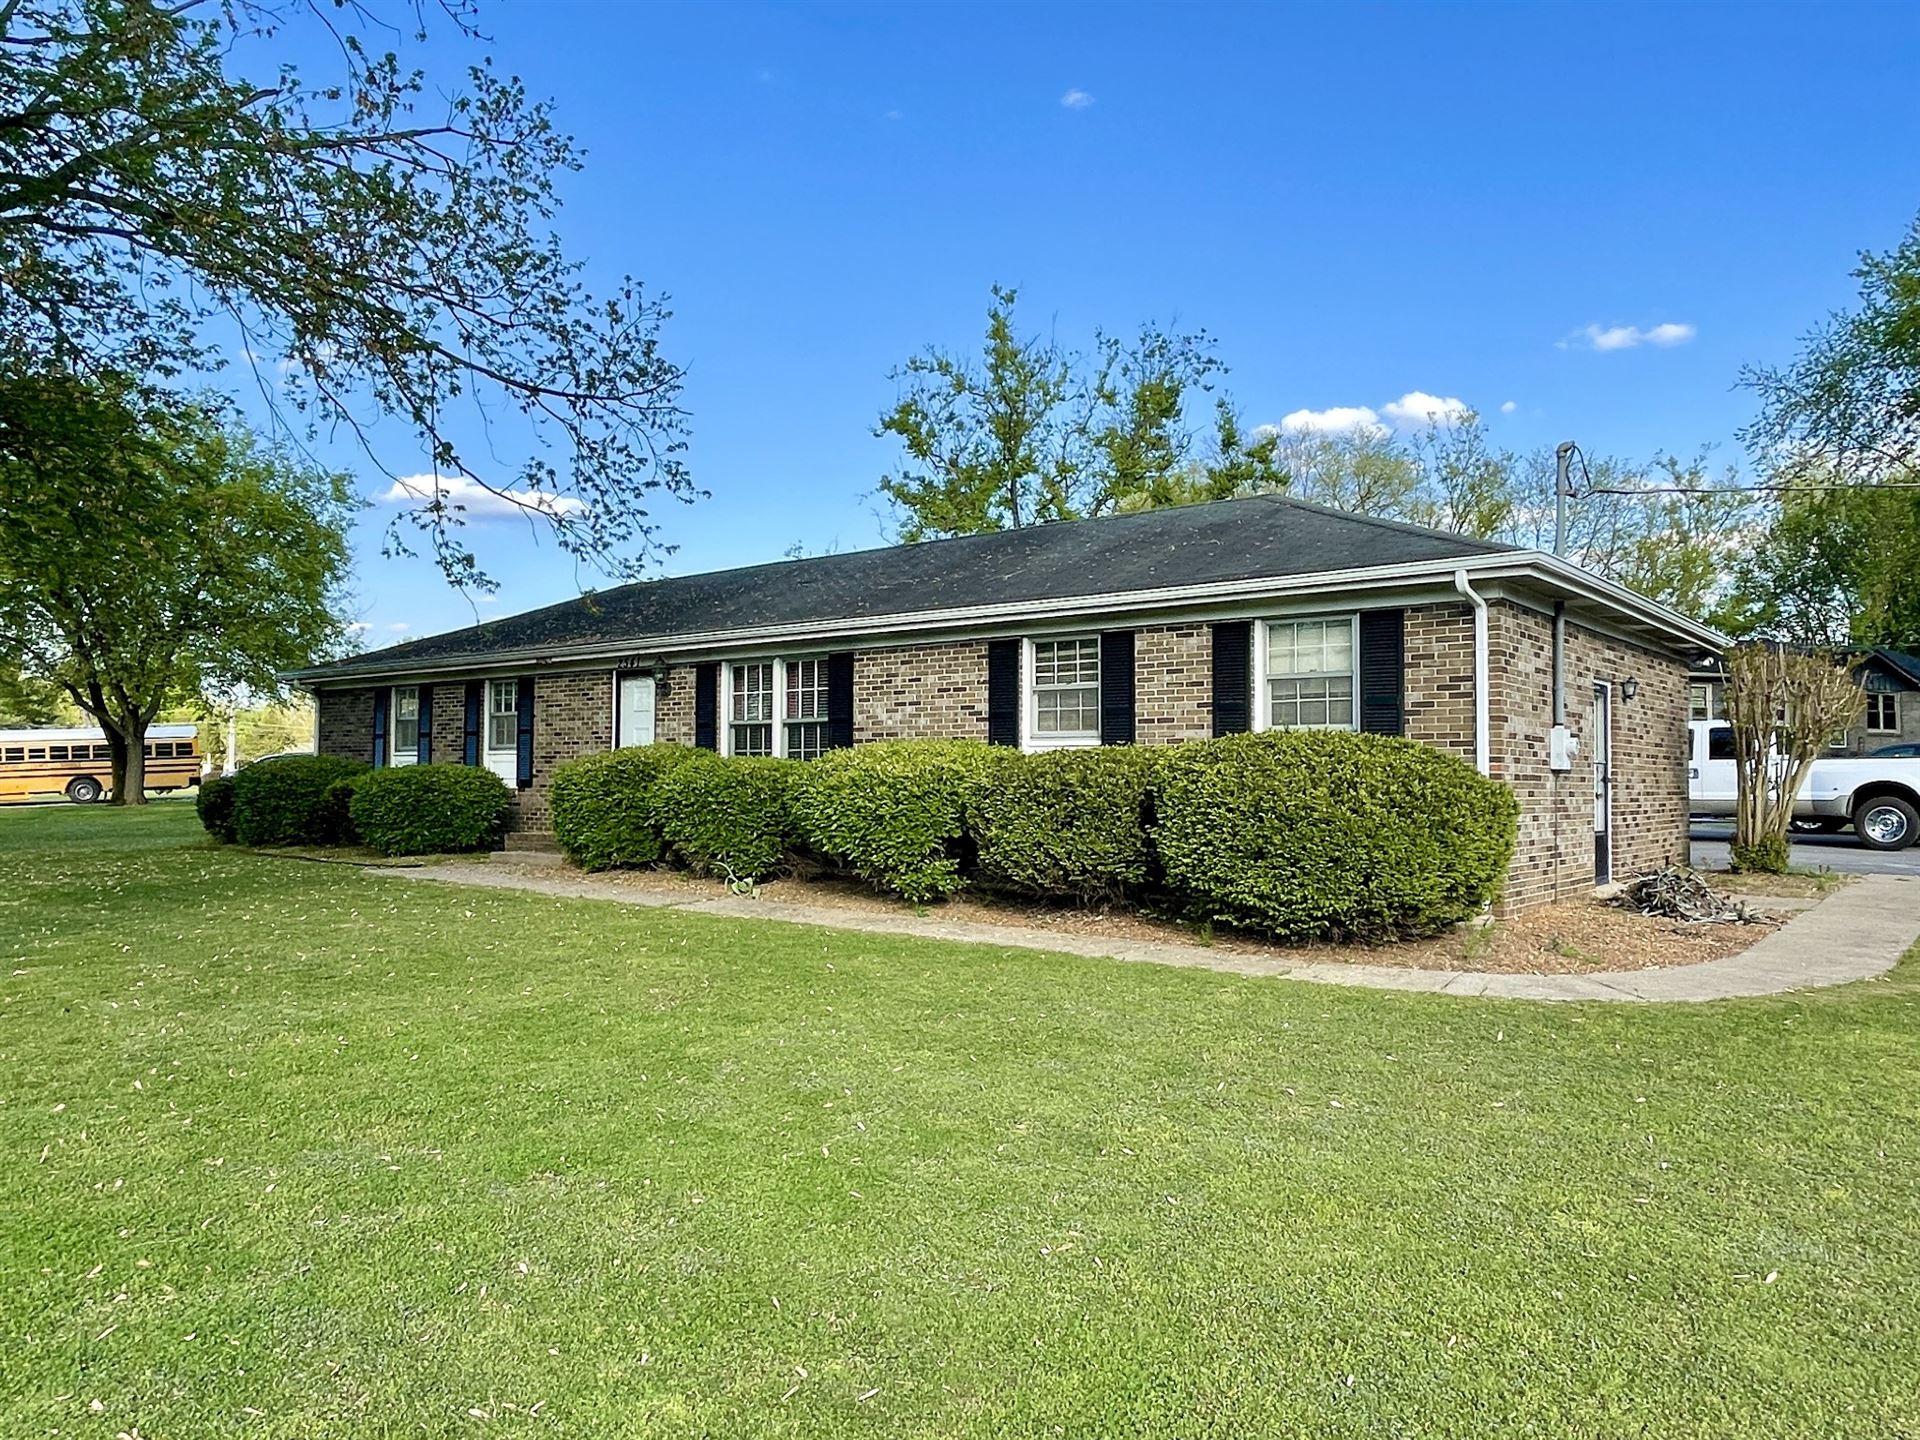 Photo of 2541 Birdsong Ave, Murfreesboro, TN 37129 (MLS # 2250634)